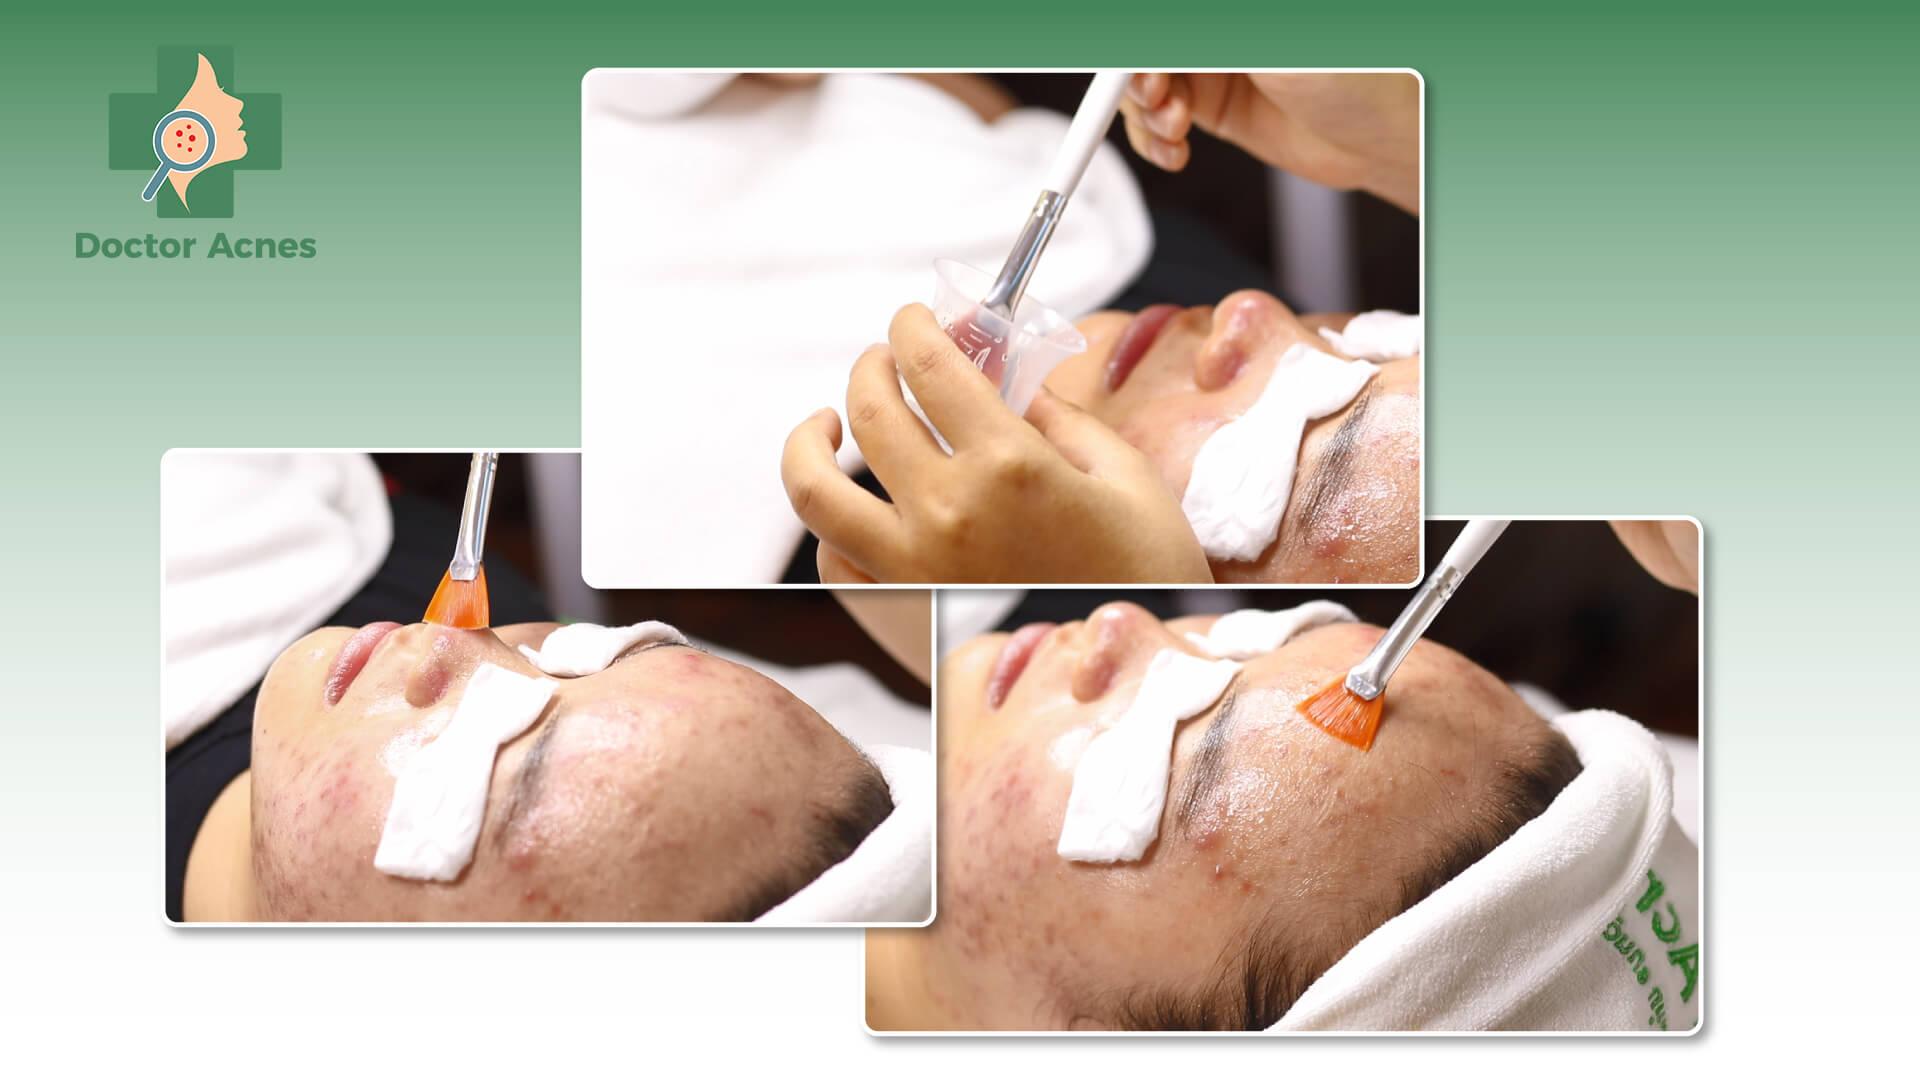 Peel da trong điều trị sẹo rỗ tại Doctor Acnes